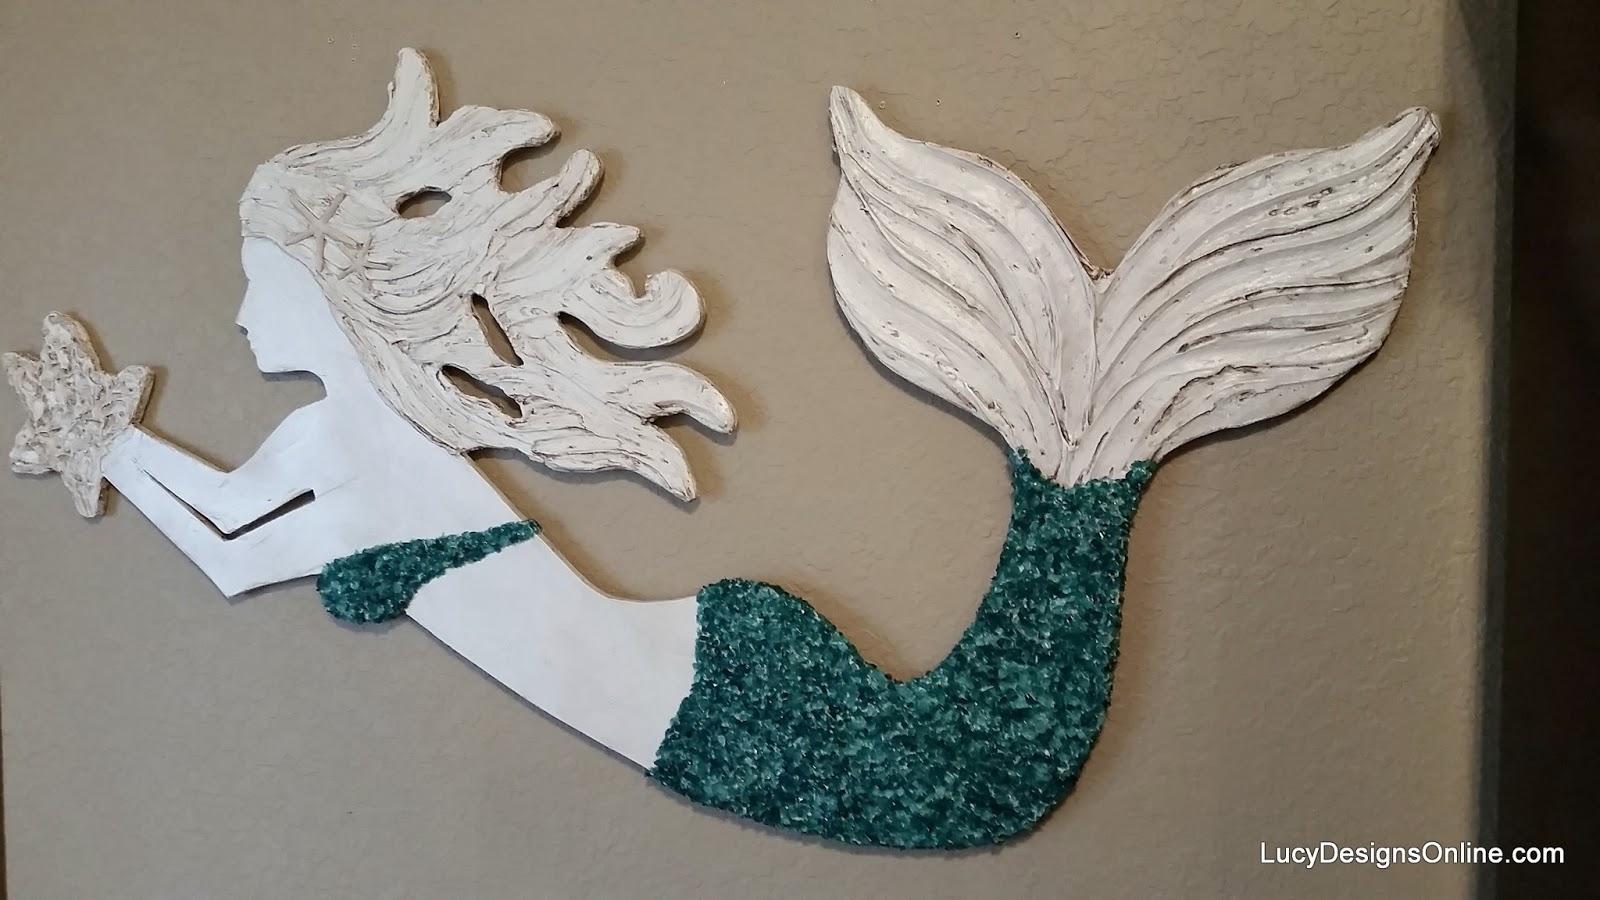 Diy Mermaid Wall Decor : Large wooden mermaid wall art coast beach